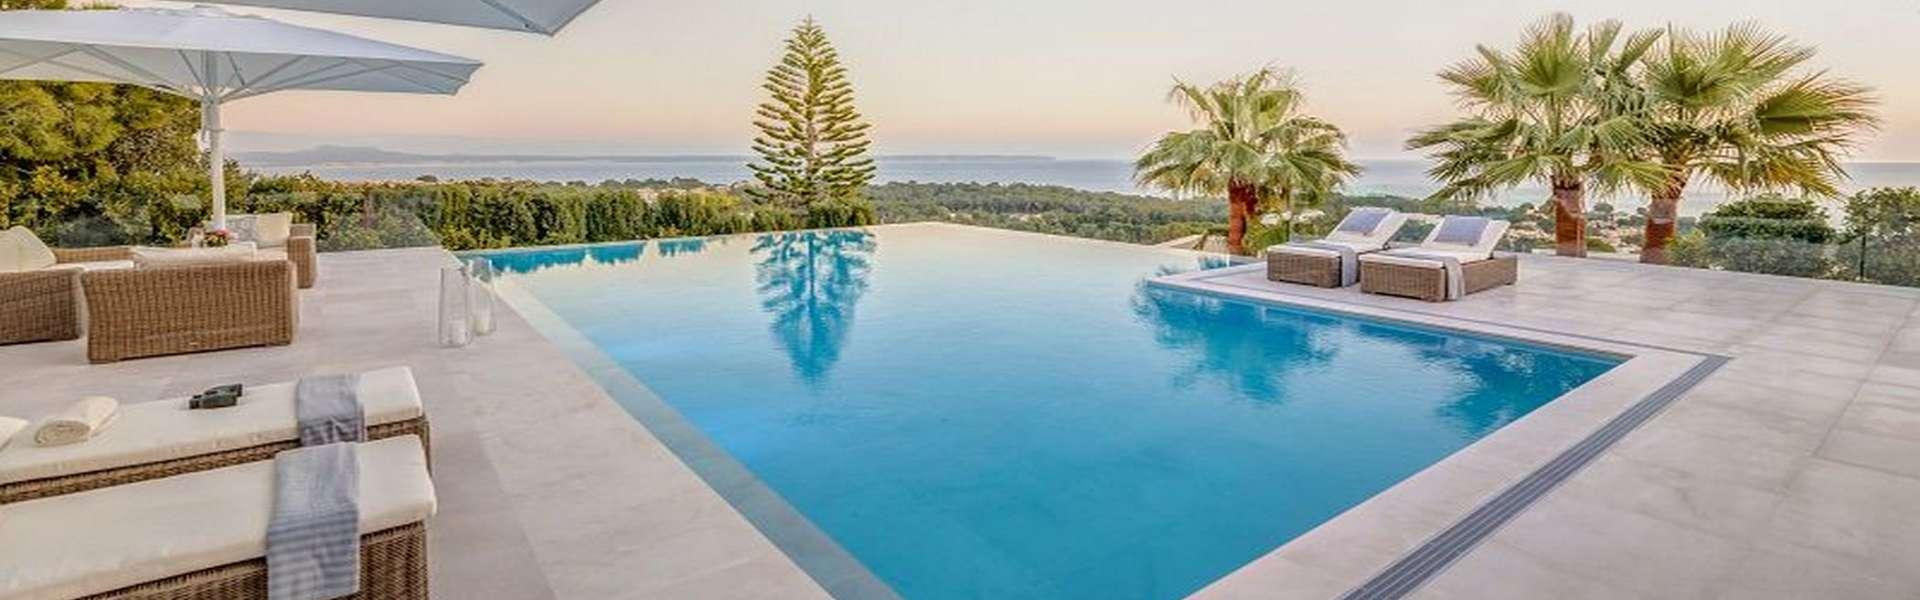 Impressive Villa in Bendinat for sale